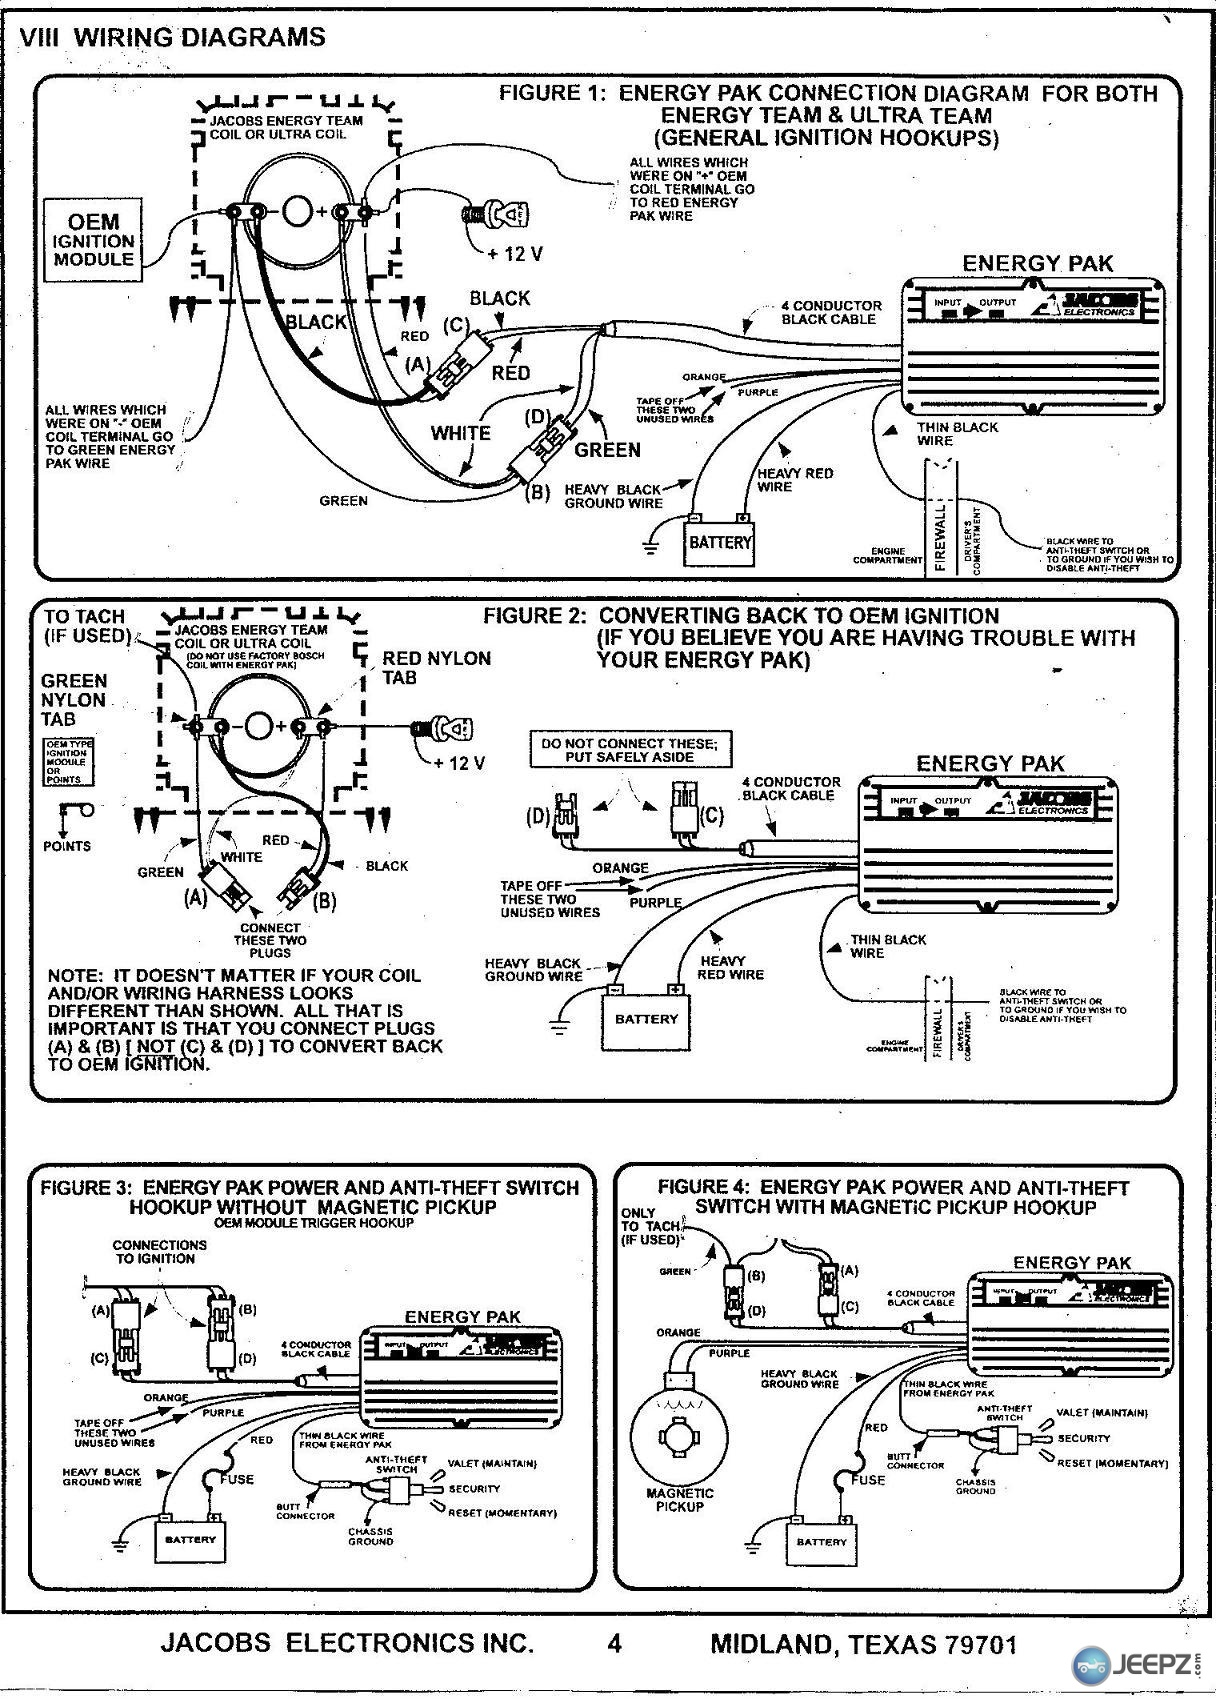 2965d1246241329 jacobs ignition jeepz jacobs ignition diagram?resize\\\\d665%2C931\\\\6ssl\\\\d1 jacobs electronics wire diagram wiring diagrams jacobs electronics omni pak wiring diagram at reclaimingppi.co